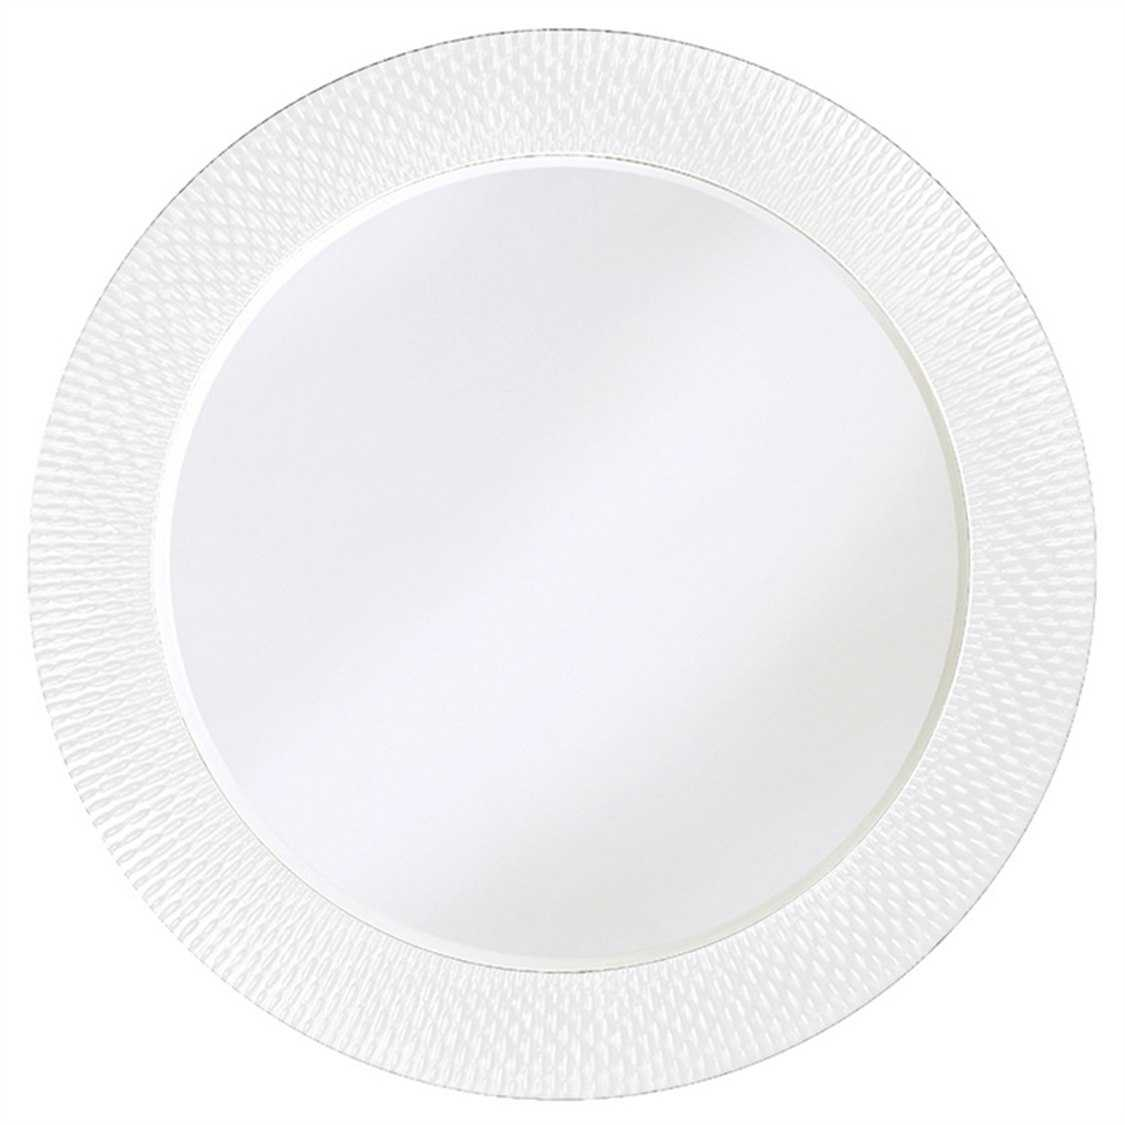 Howard elliott bergman 54 round white large wall mirror for Large white round mirror